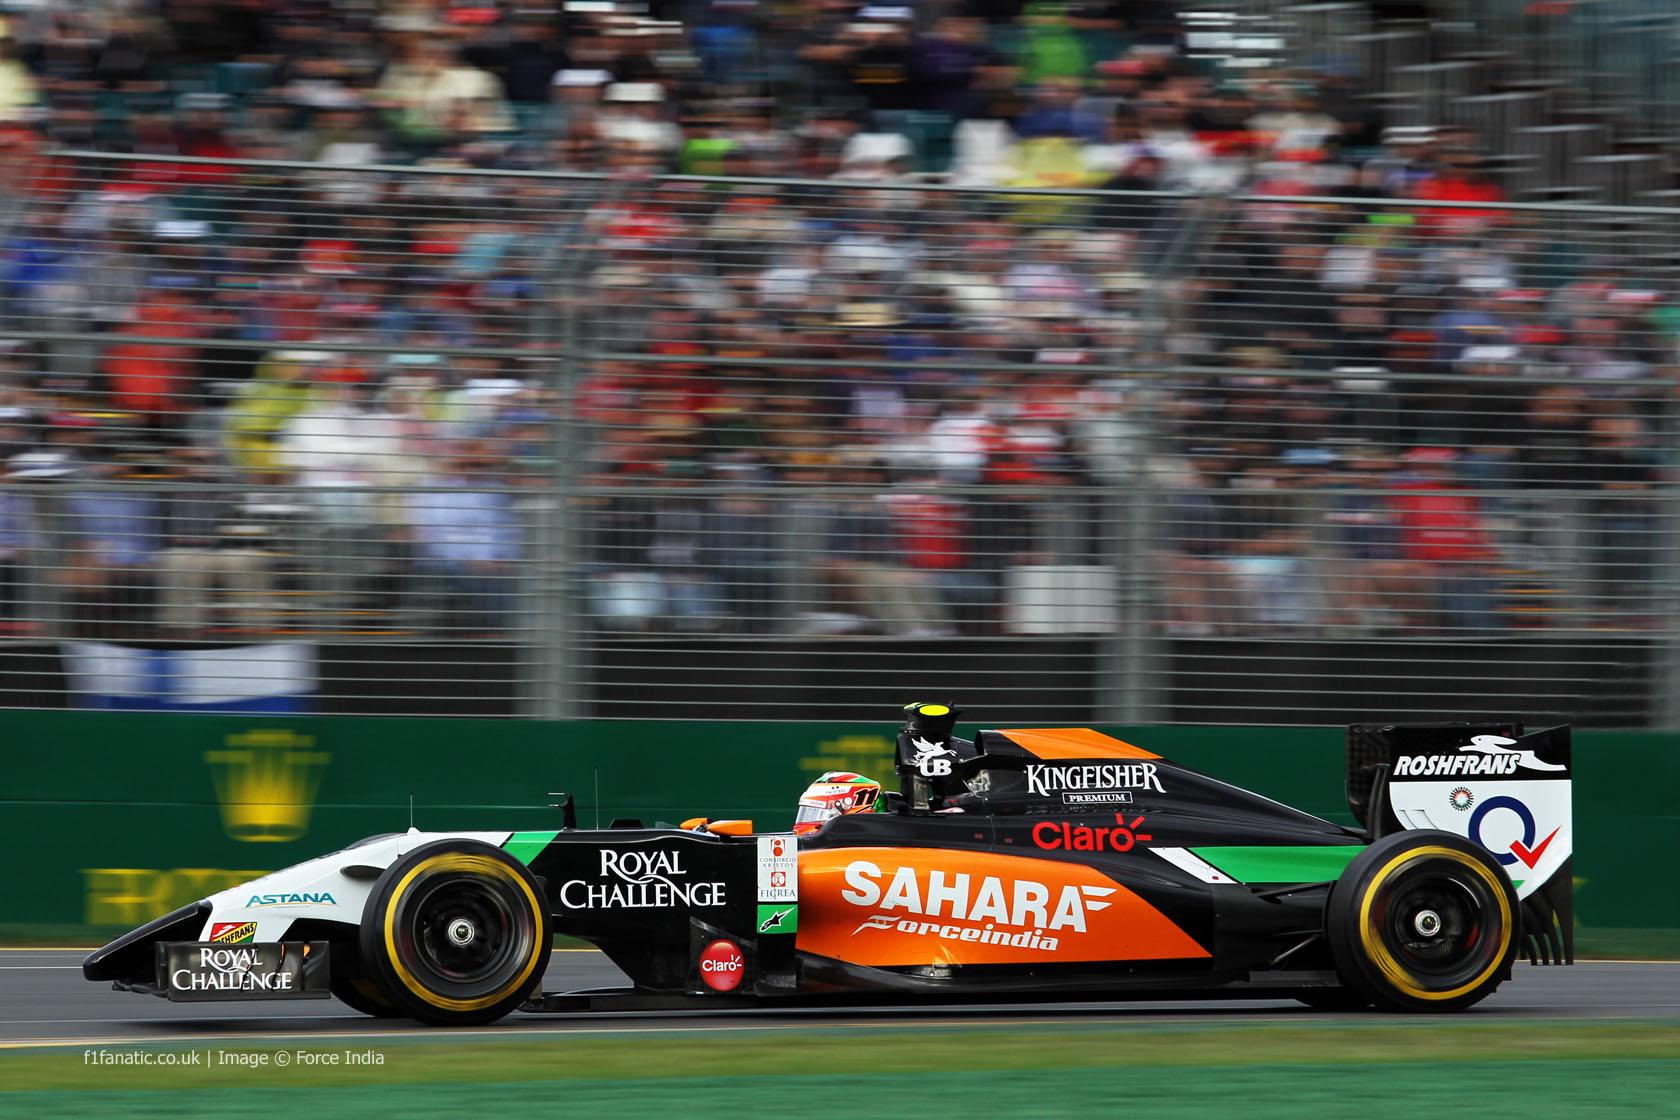 Sergio Perez, Force India, Albert Park, 2014